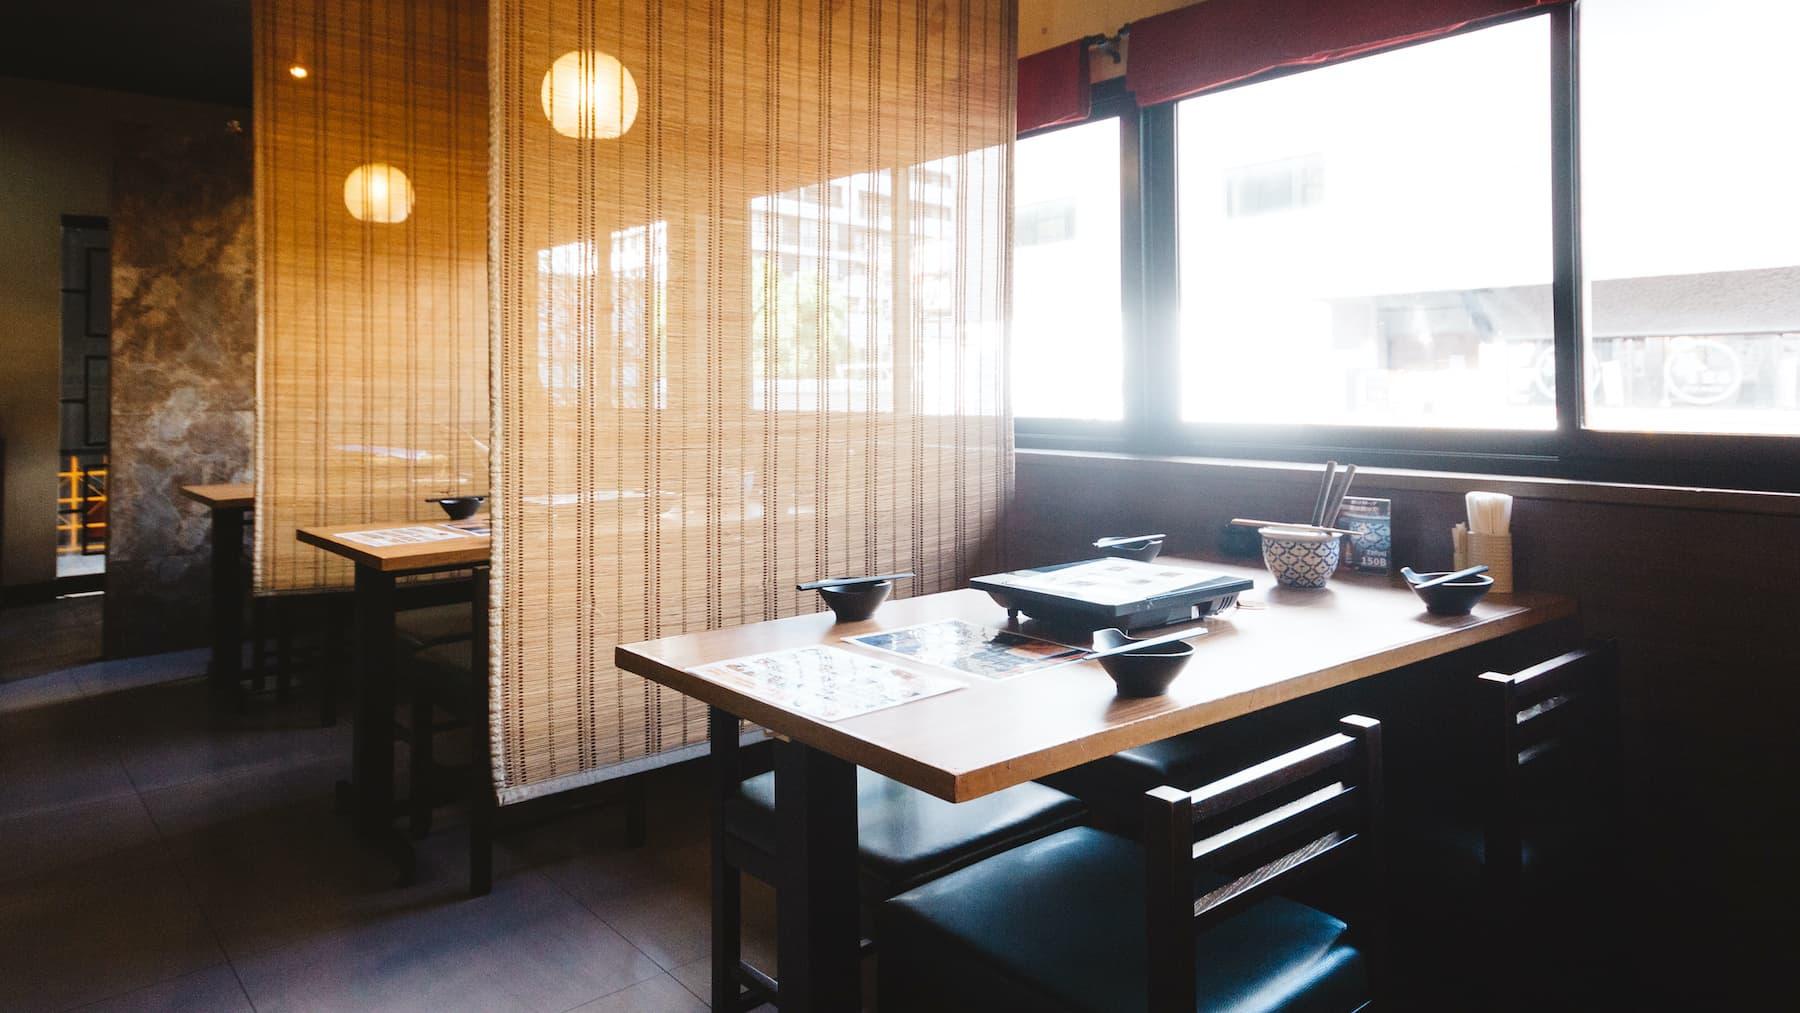 restauracja japońska